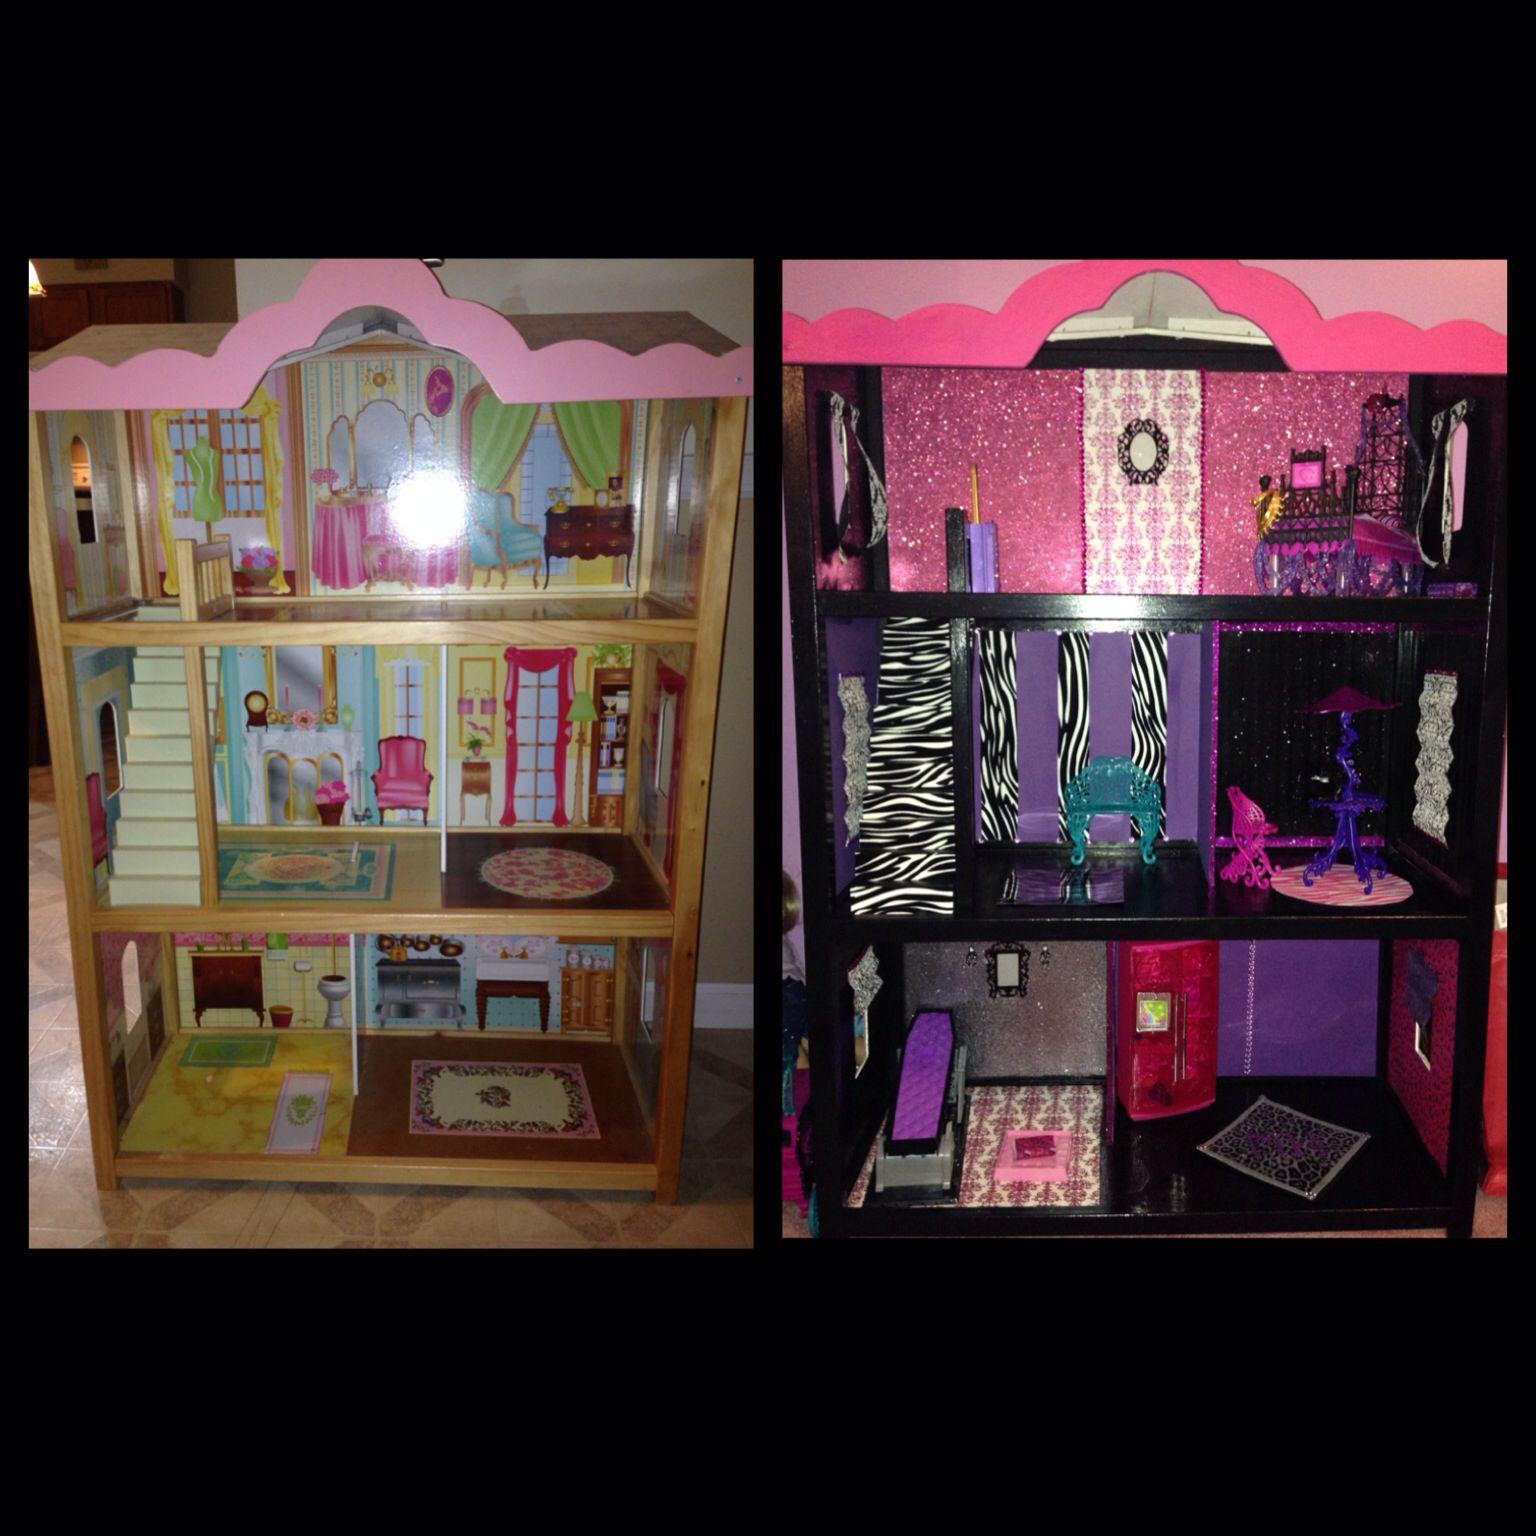 Monster High Doll House Diy Monster High Crafts Monster High